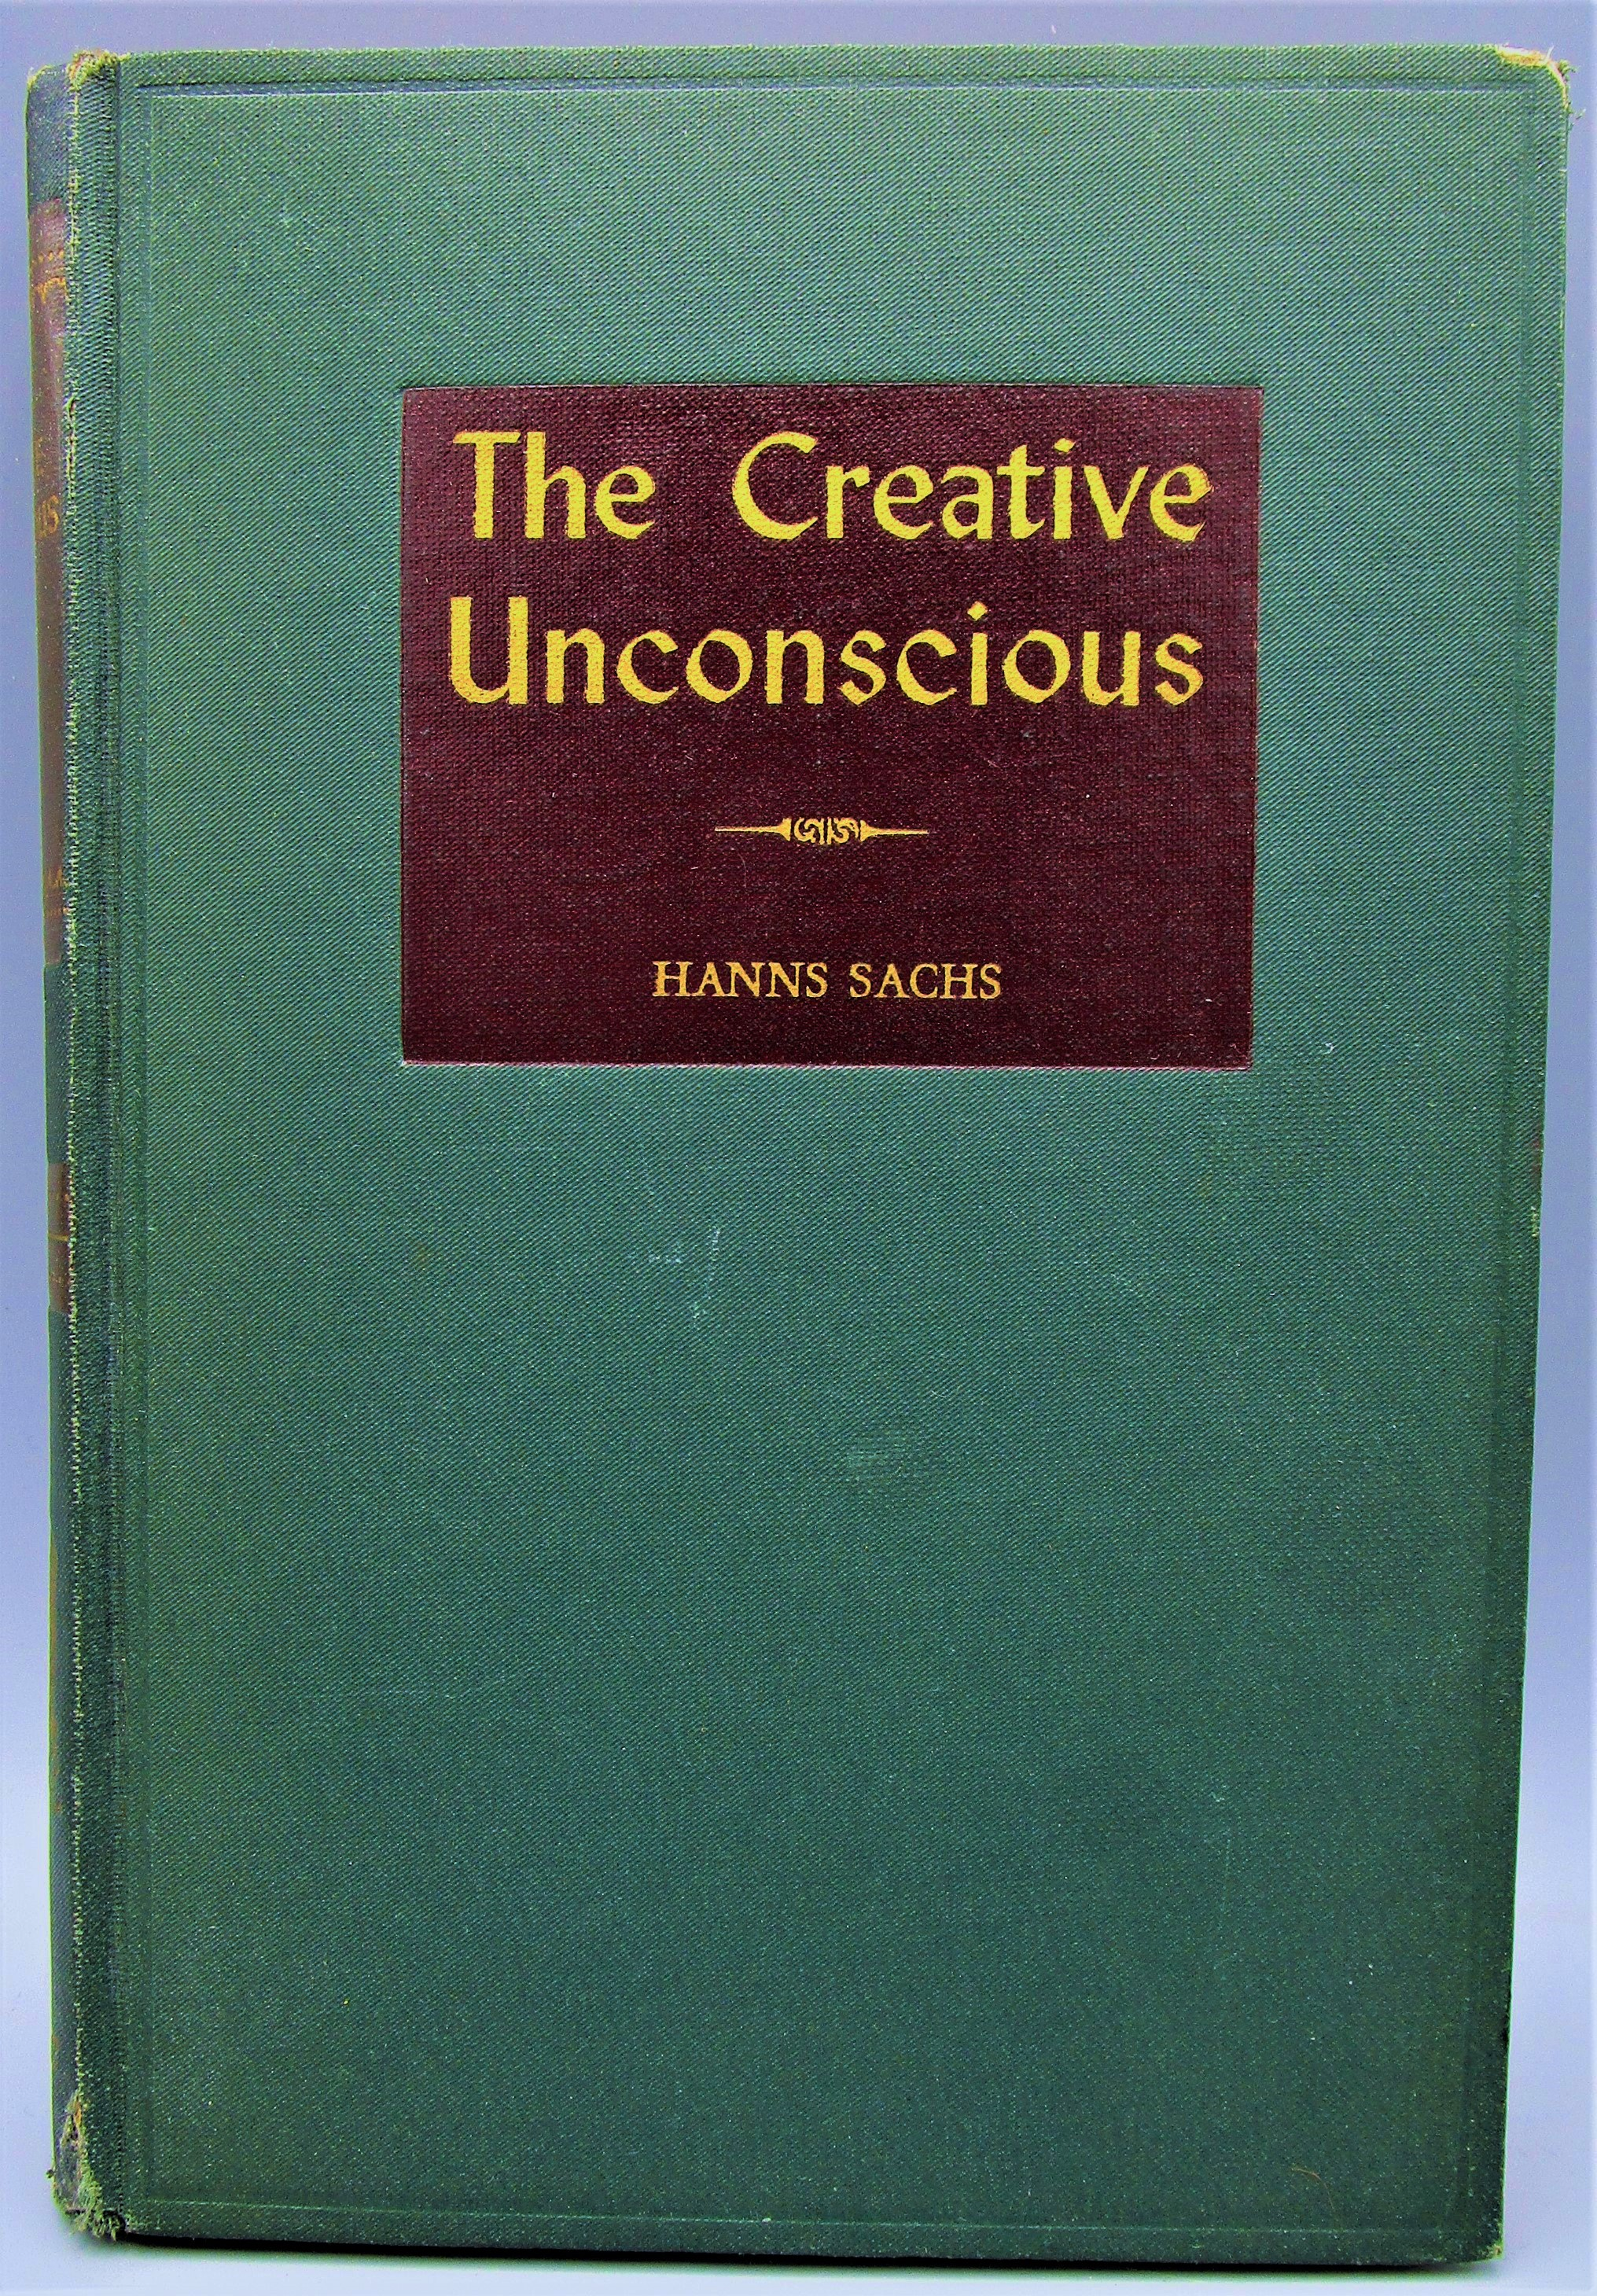 THE CREATIVE UNCONSCIOUS, by Hanns Sachs - 1942 [1st Ed]